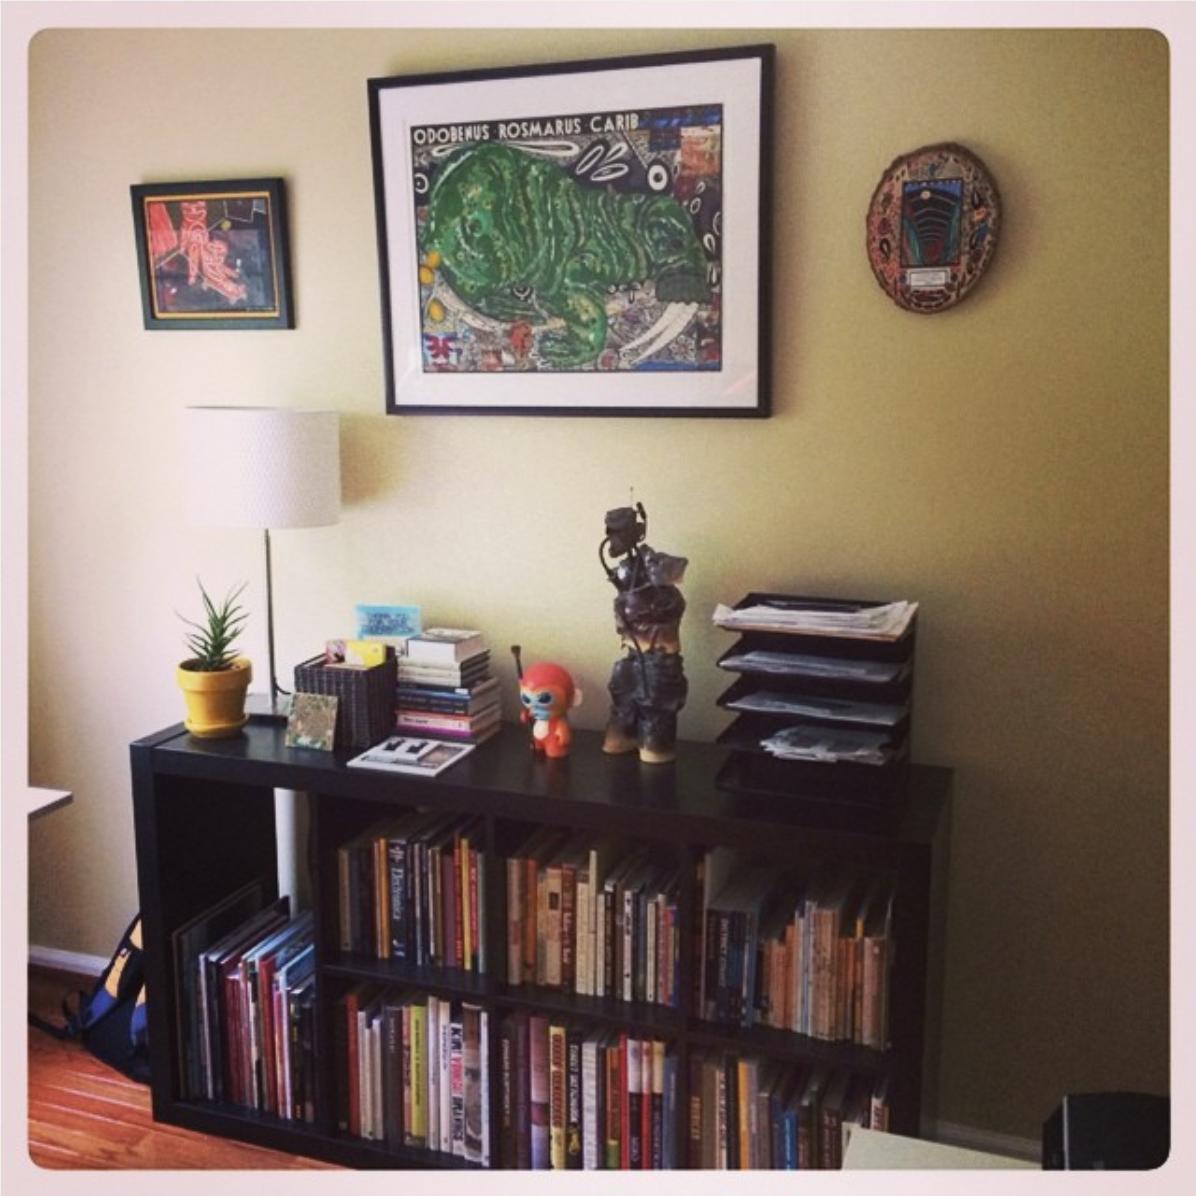 Steve Loya 's colorful studio. (submitted via Instagram by  Sloya72 )